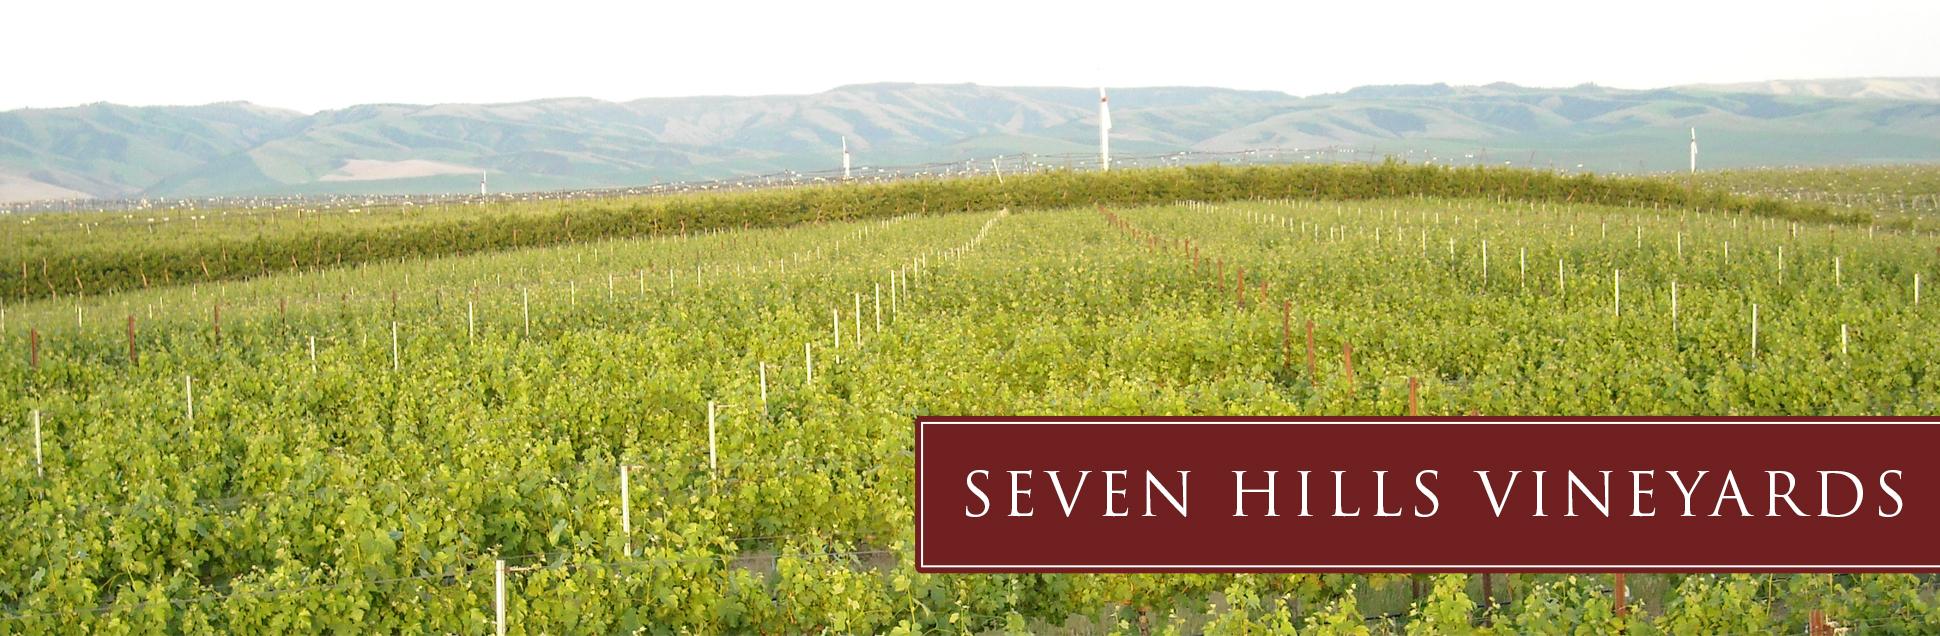 sh-vineyard-about.jpg